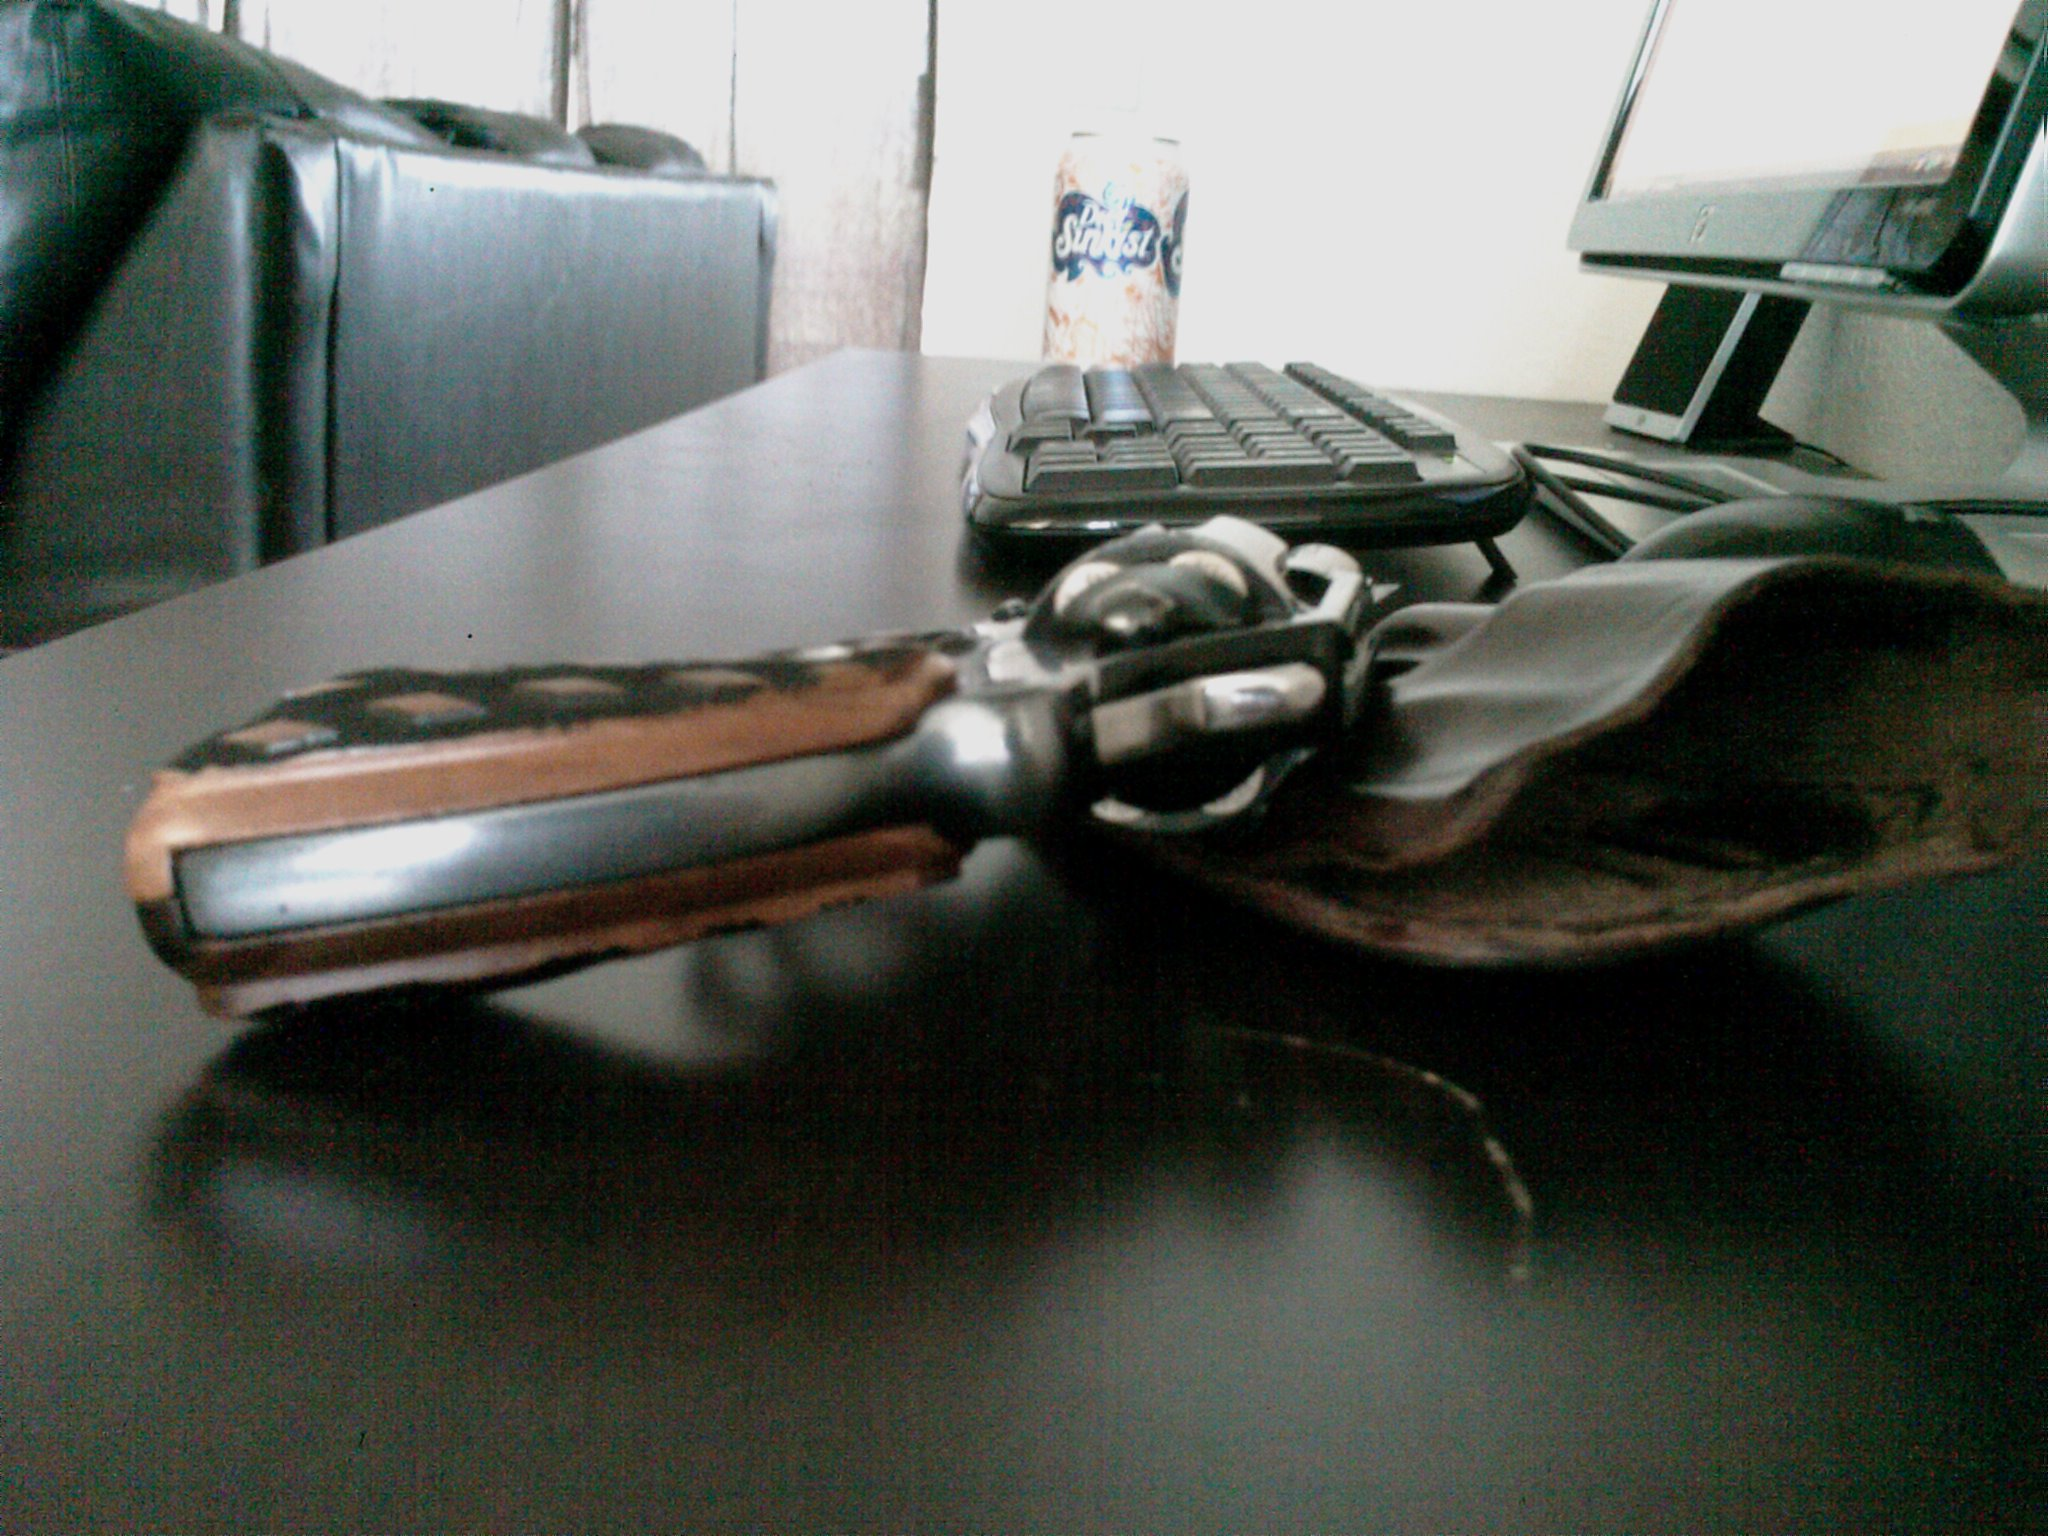 My Colt cobra with it's new tweak-imag0158.jpg